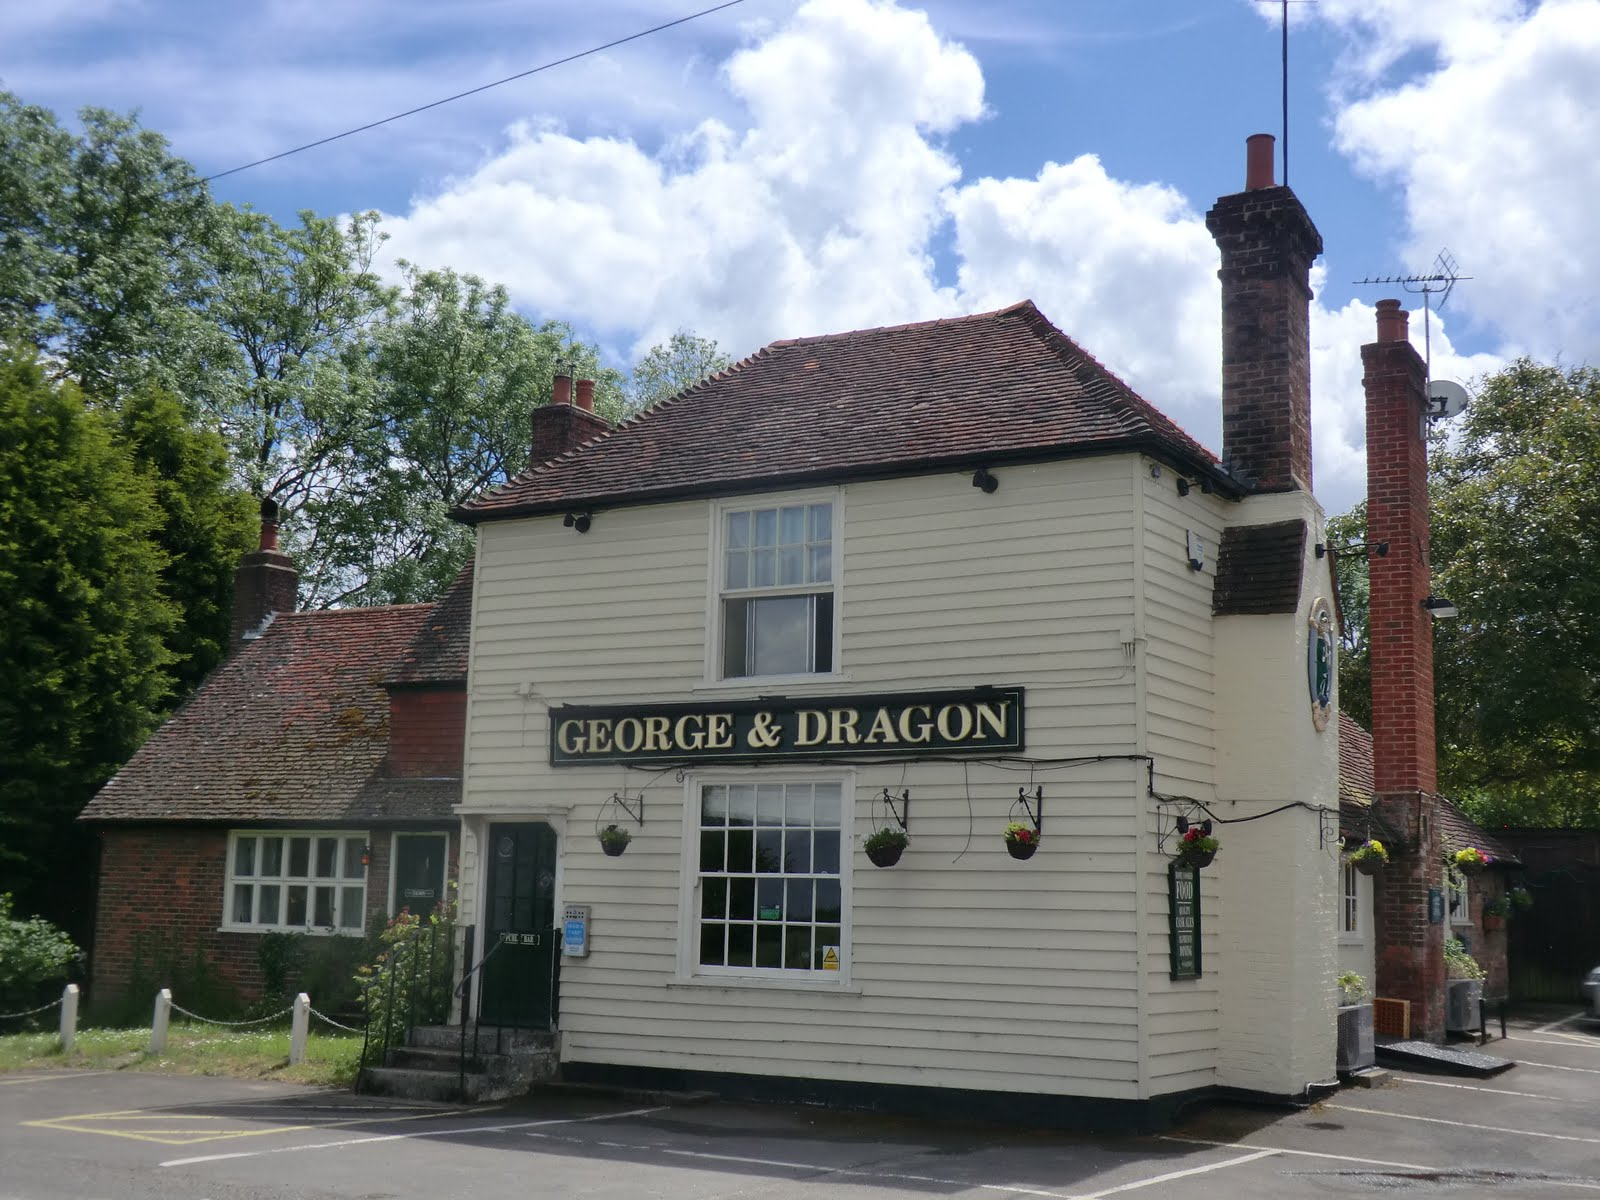 CIMG1593 George & Dragon, Five Oak Green Road